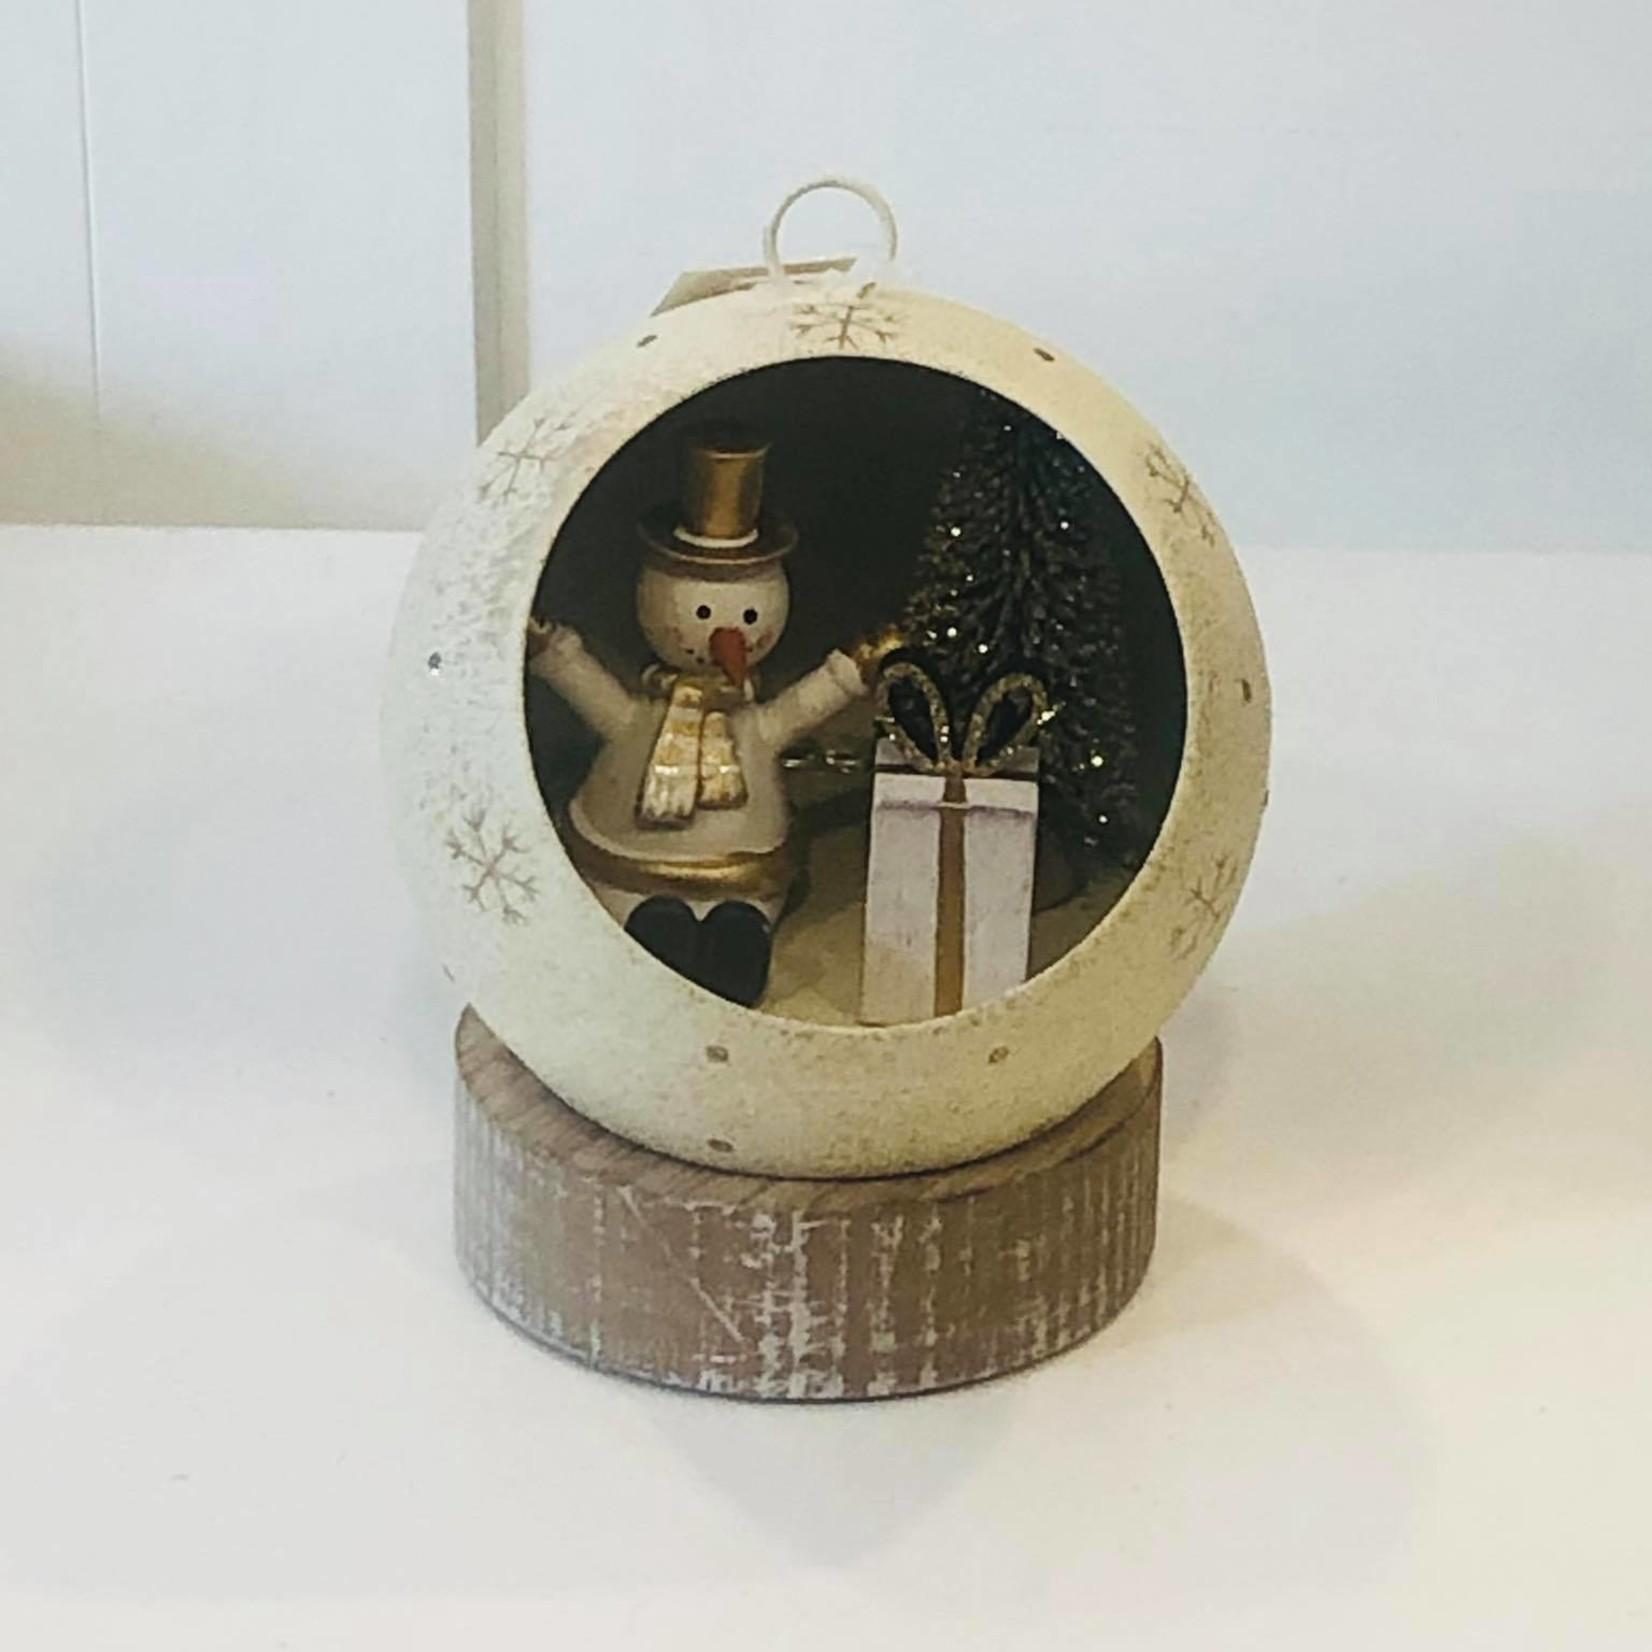 LED ornament sneeuwman - Ø12cm x 13cm hoog